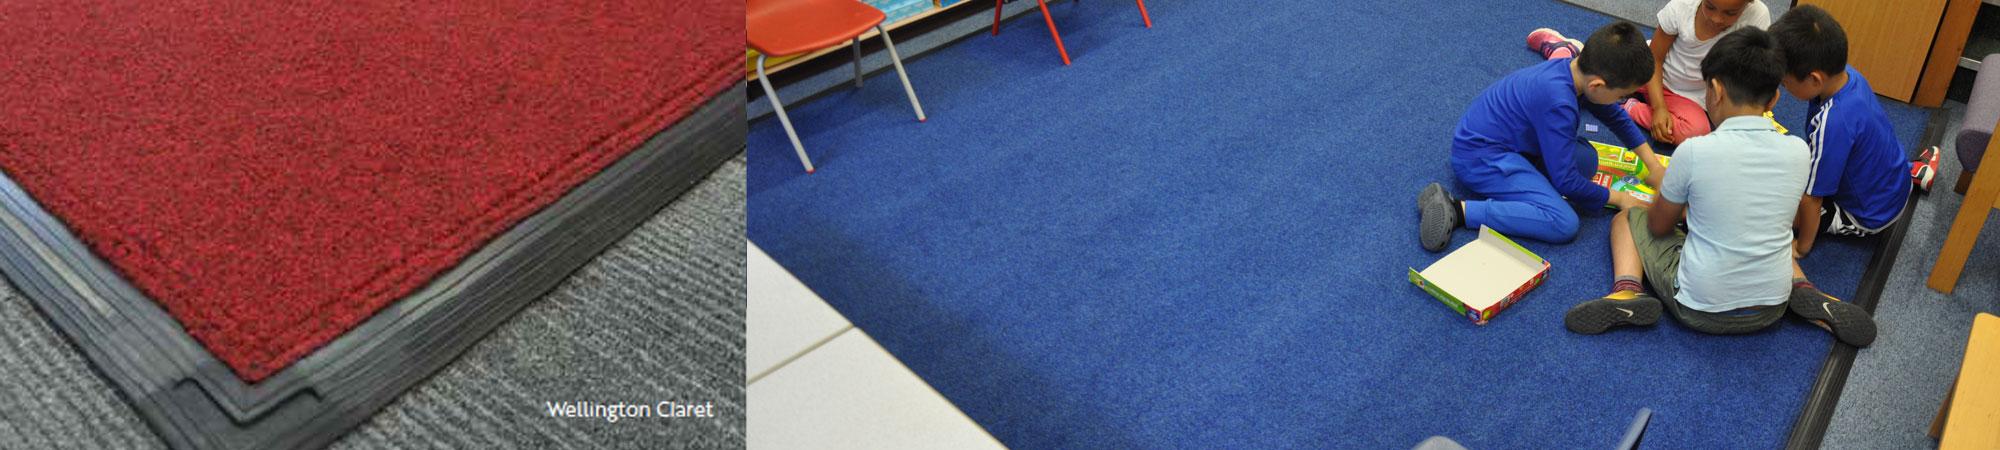 loose lay classroom mats